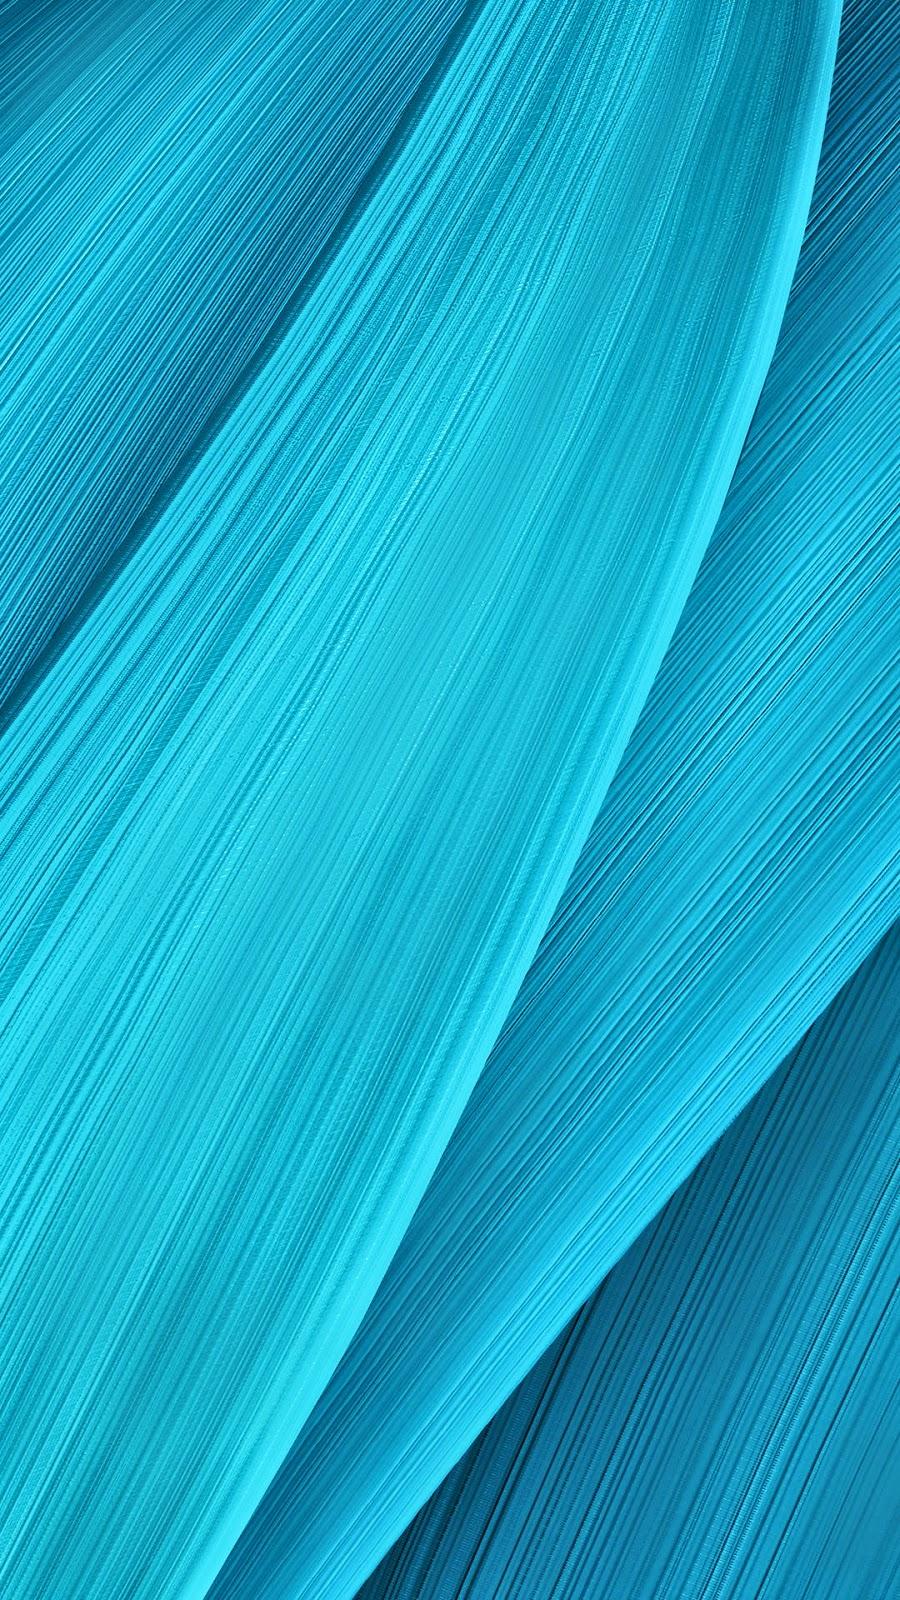 Zenfone 2 Wallpapers da Semana 8